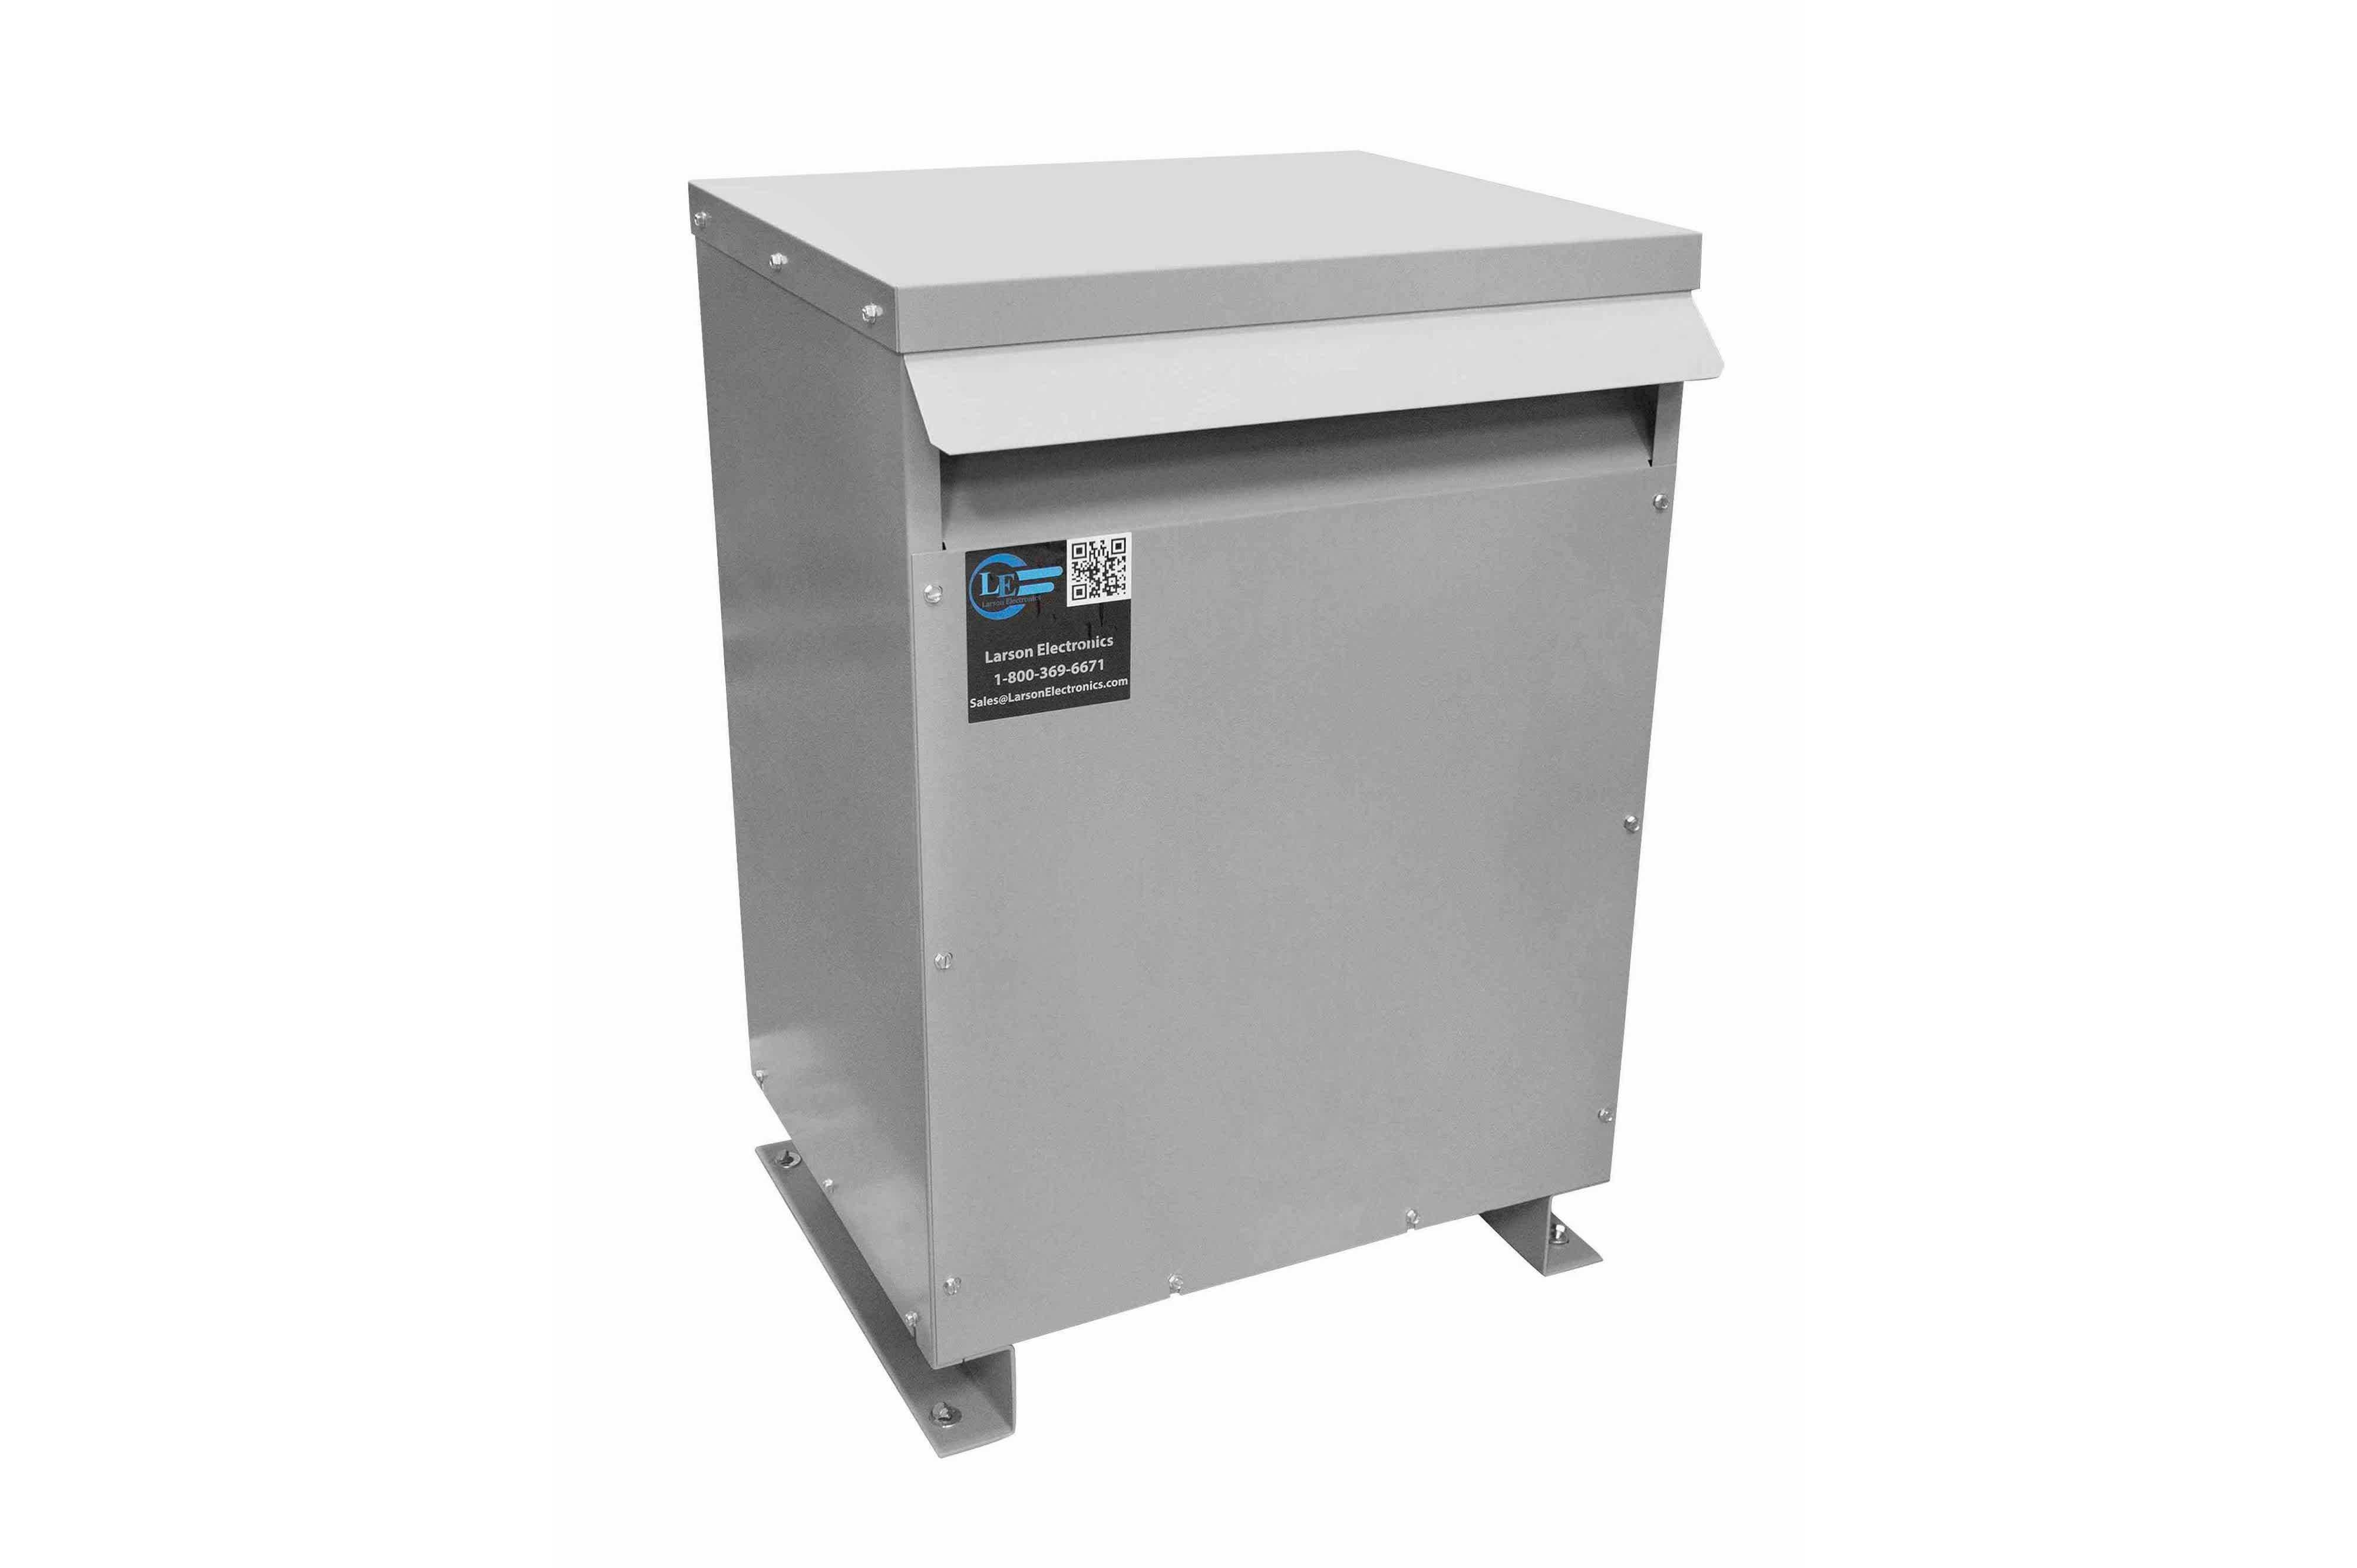 20 kVA 3PH Isolation Transformer, 575V Wye Primary, 480V Delta Secondary, N3R, Ventilated, 60 Hz